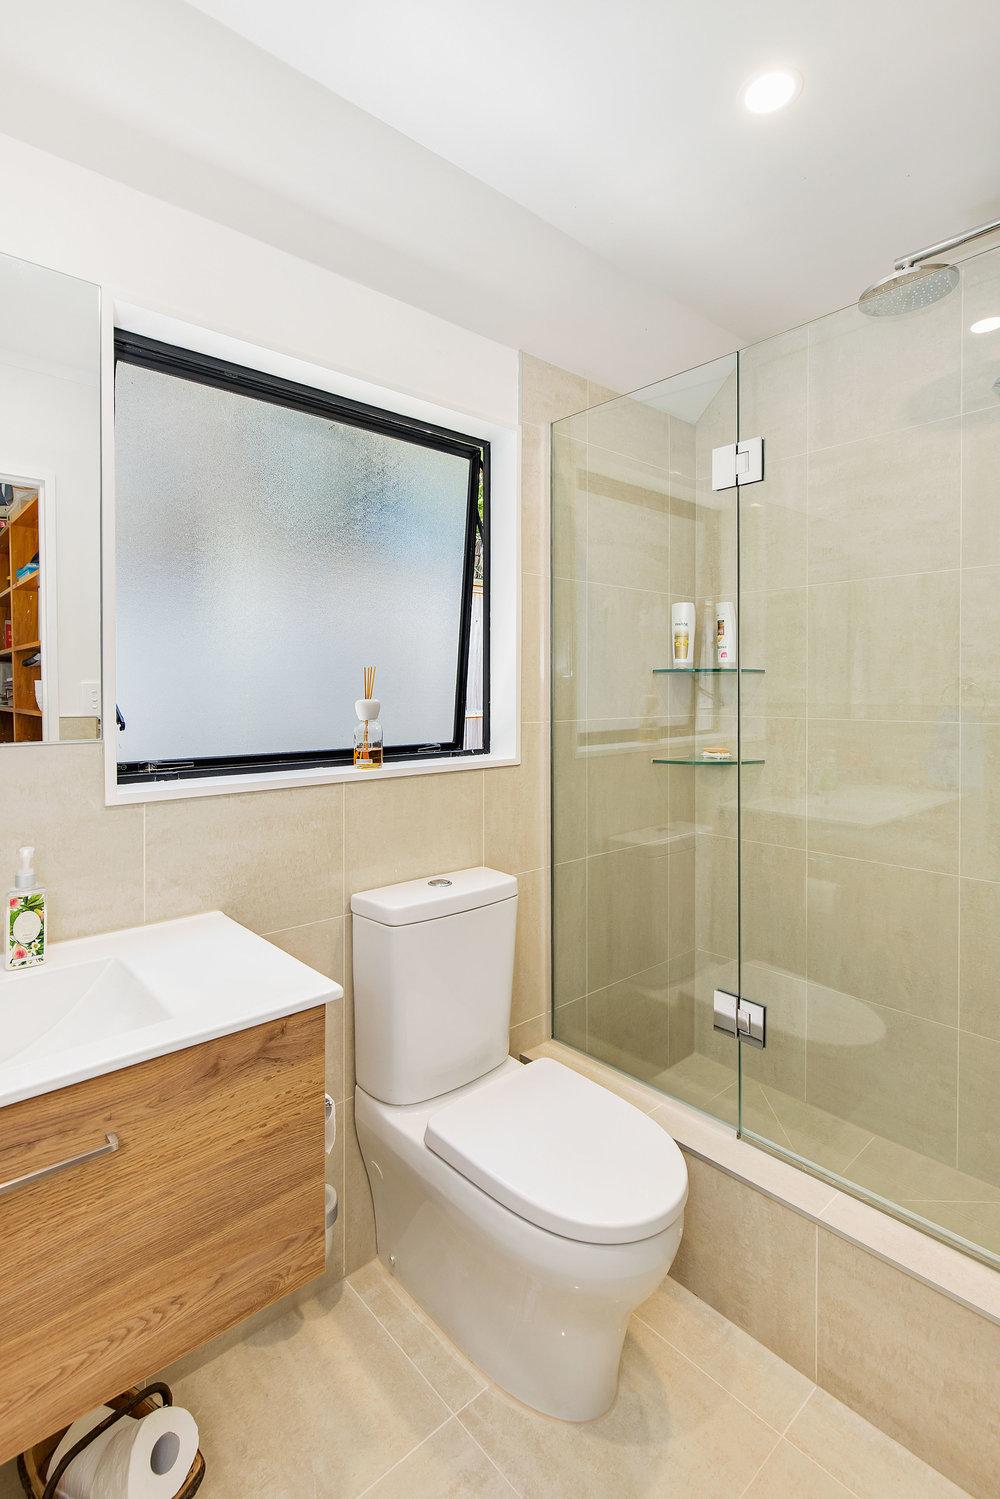 Timber bathroom vanity BTW toilet, shub (shower / Bath). Glass shelves / shelf